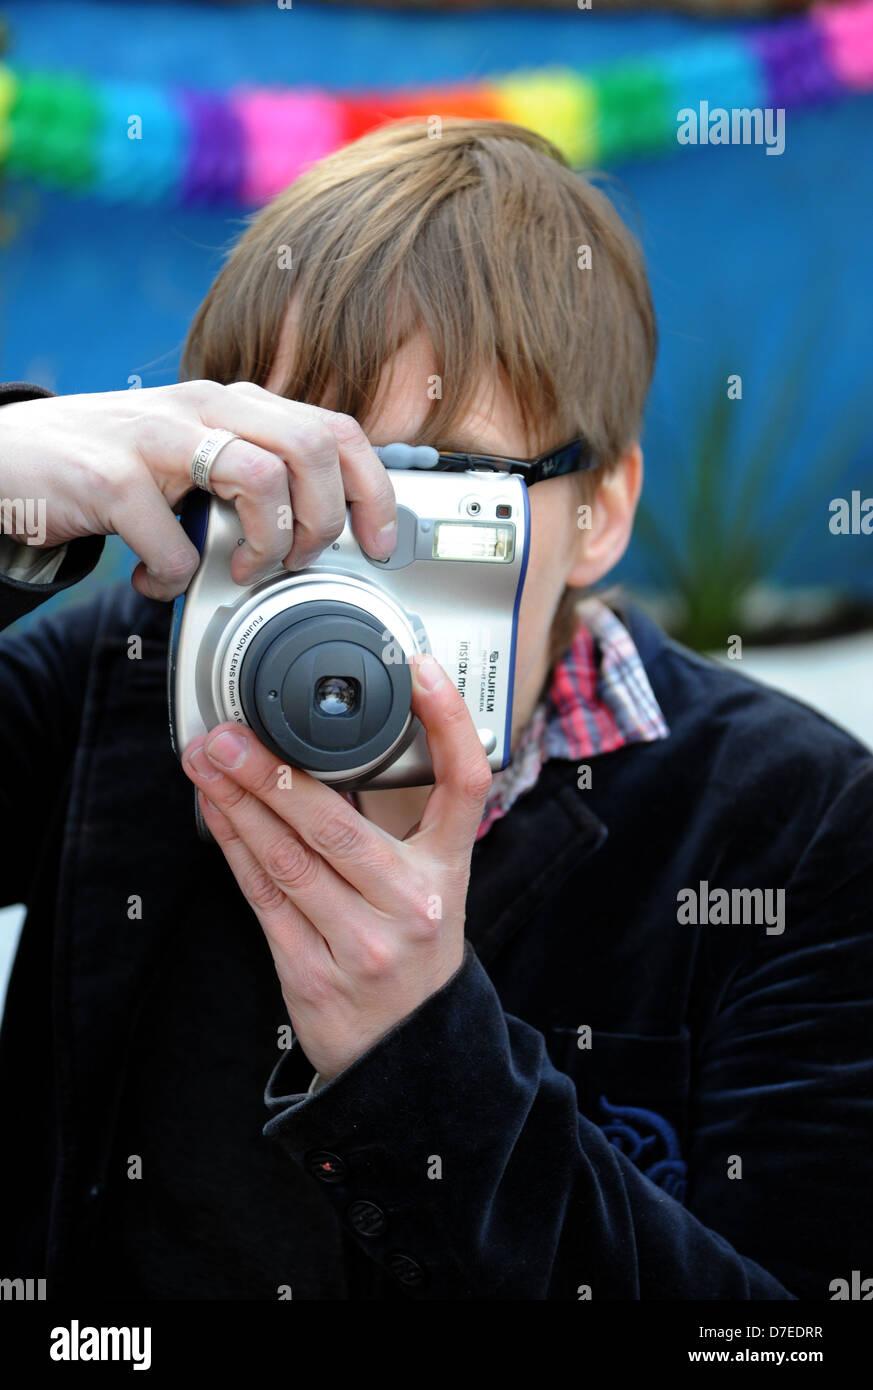 Woman using a Fuji Fujifilm instax 210 film instant camera Photograph taken by Simon Dack - Stock Image